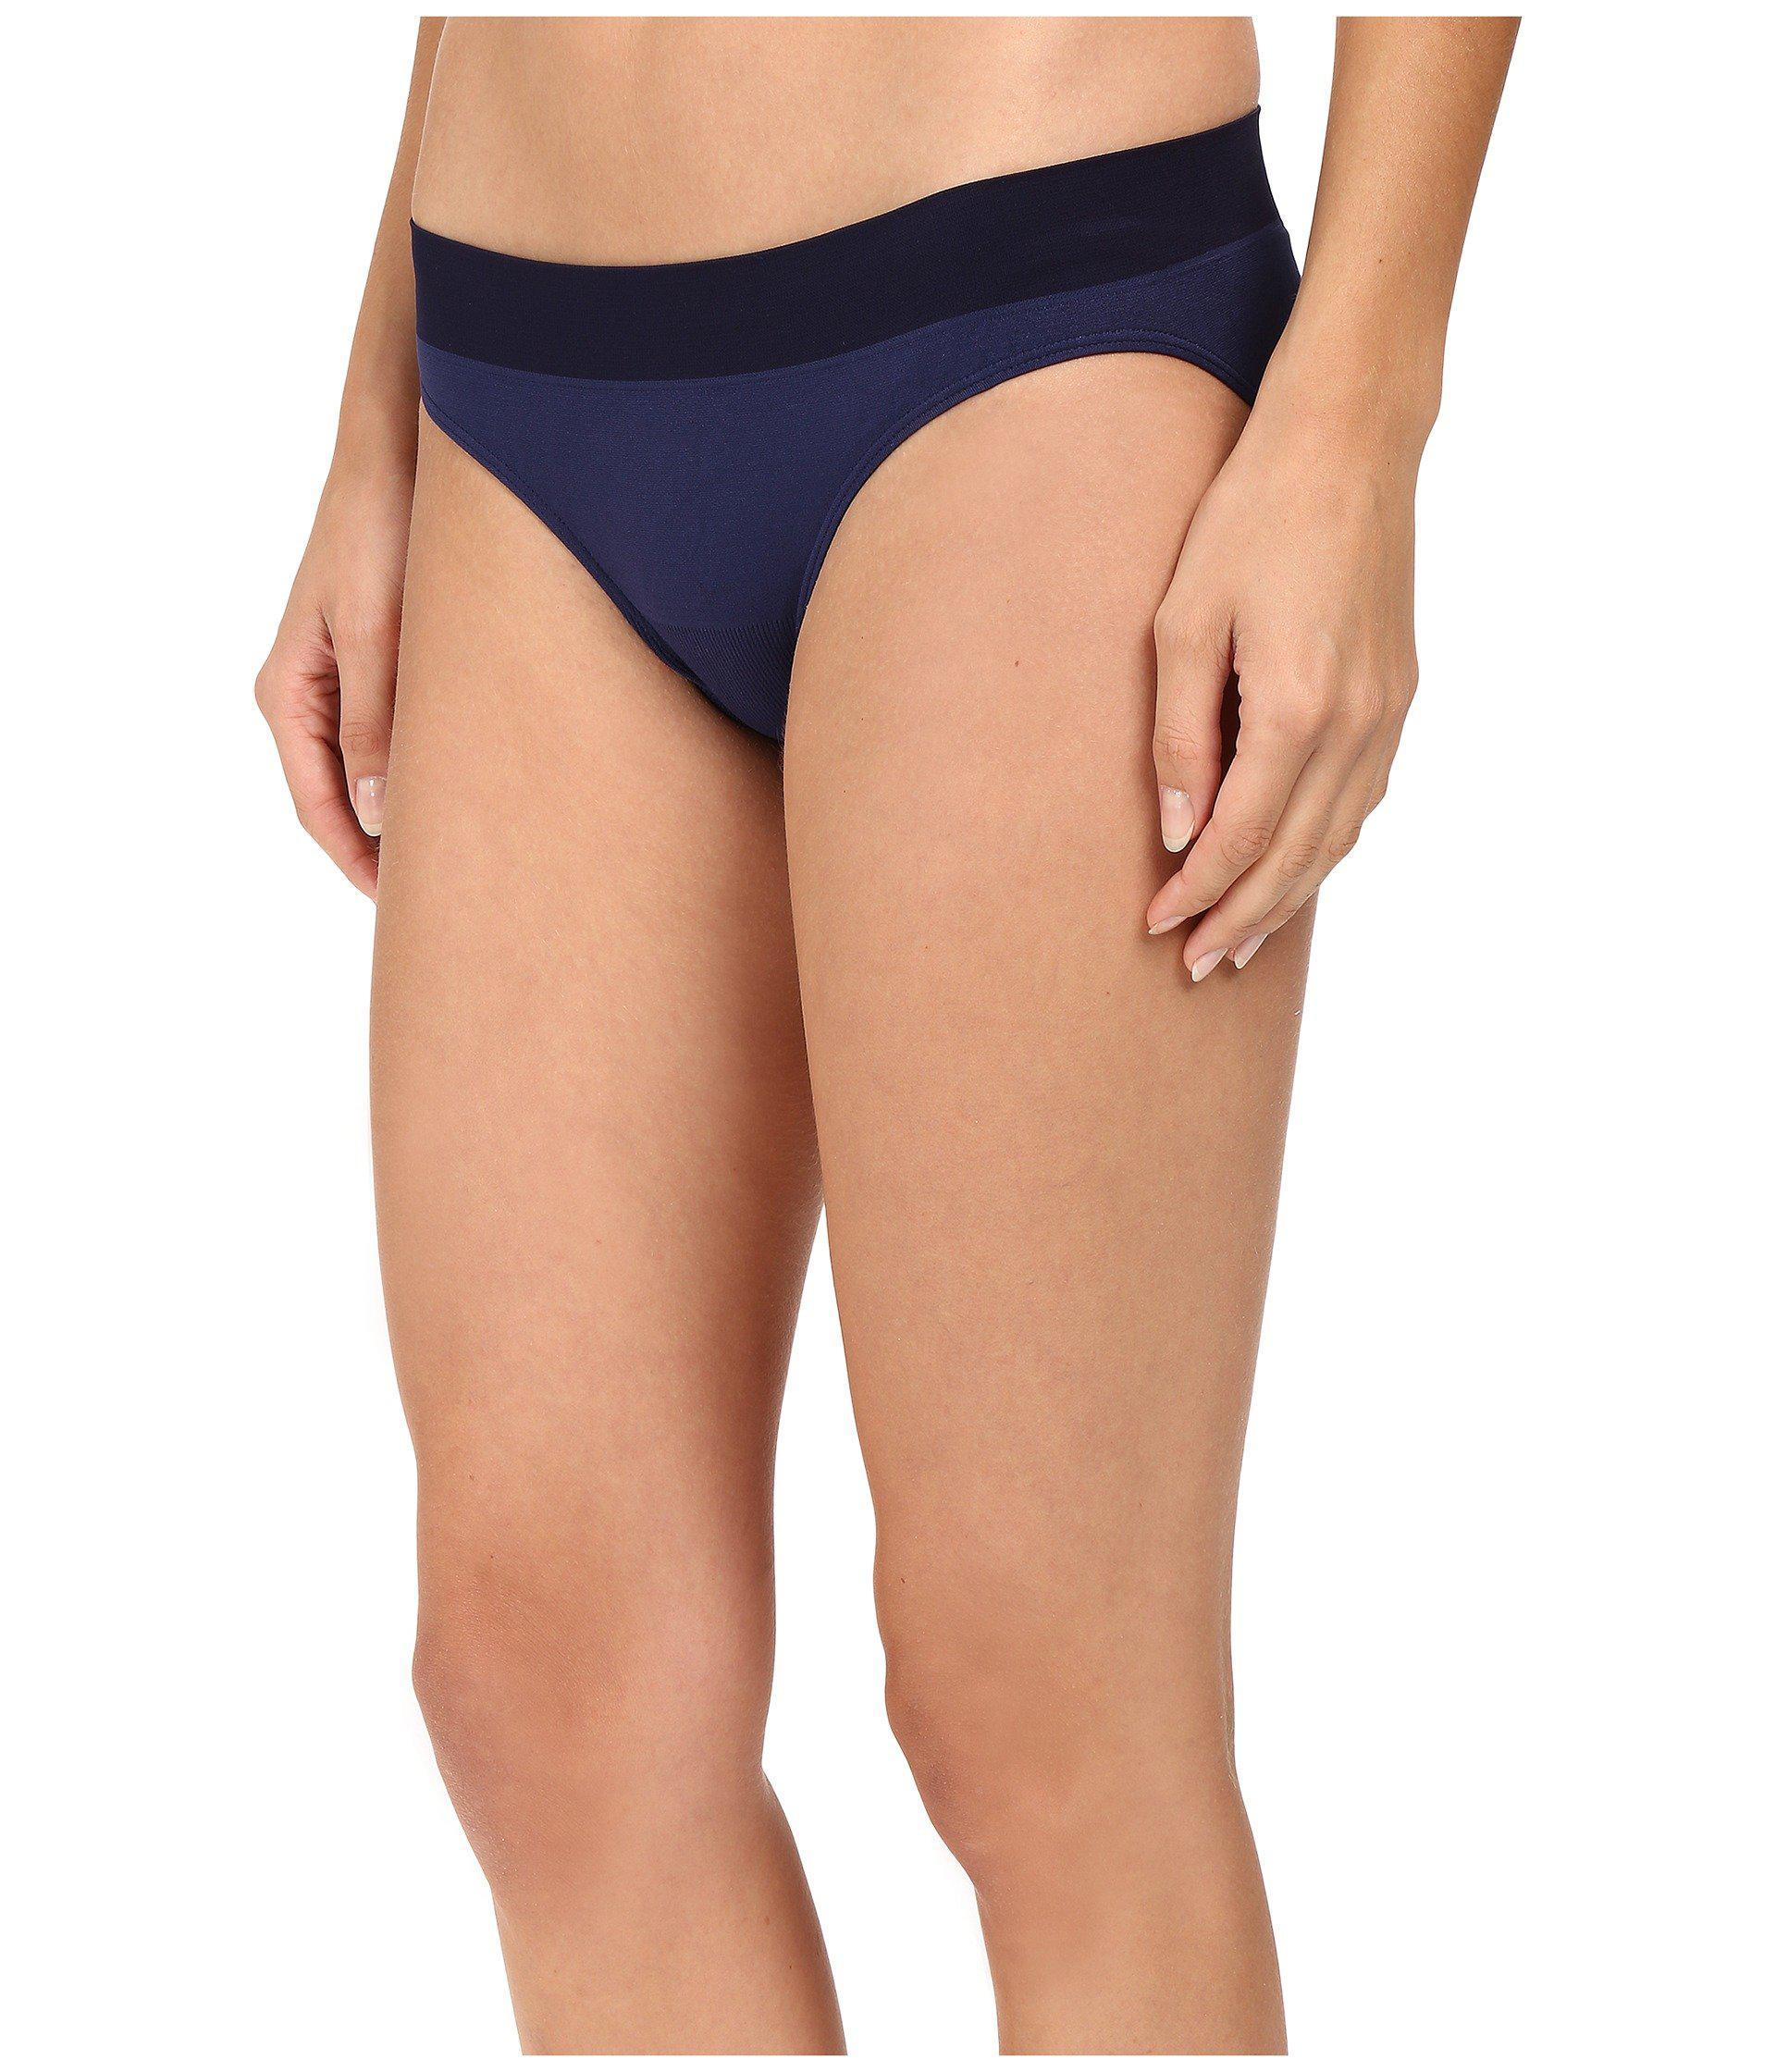 ffda503591bda Lyst - Jockey Modern Micro Bikini (black) Women s Underwear in Blue